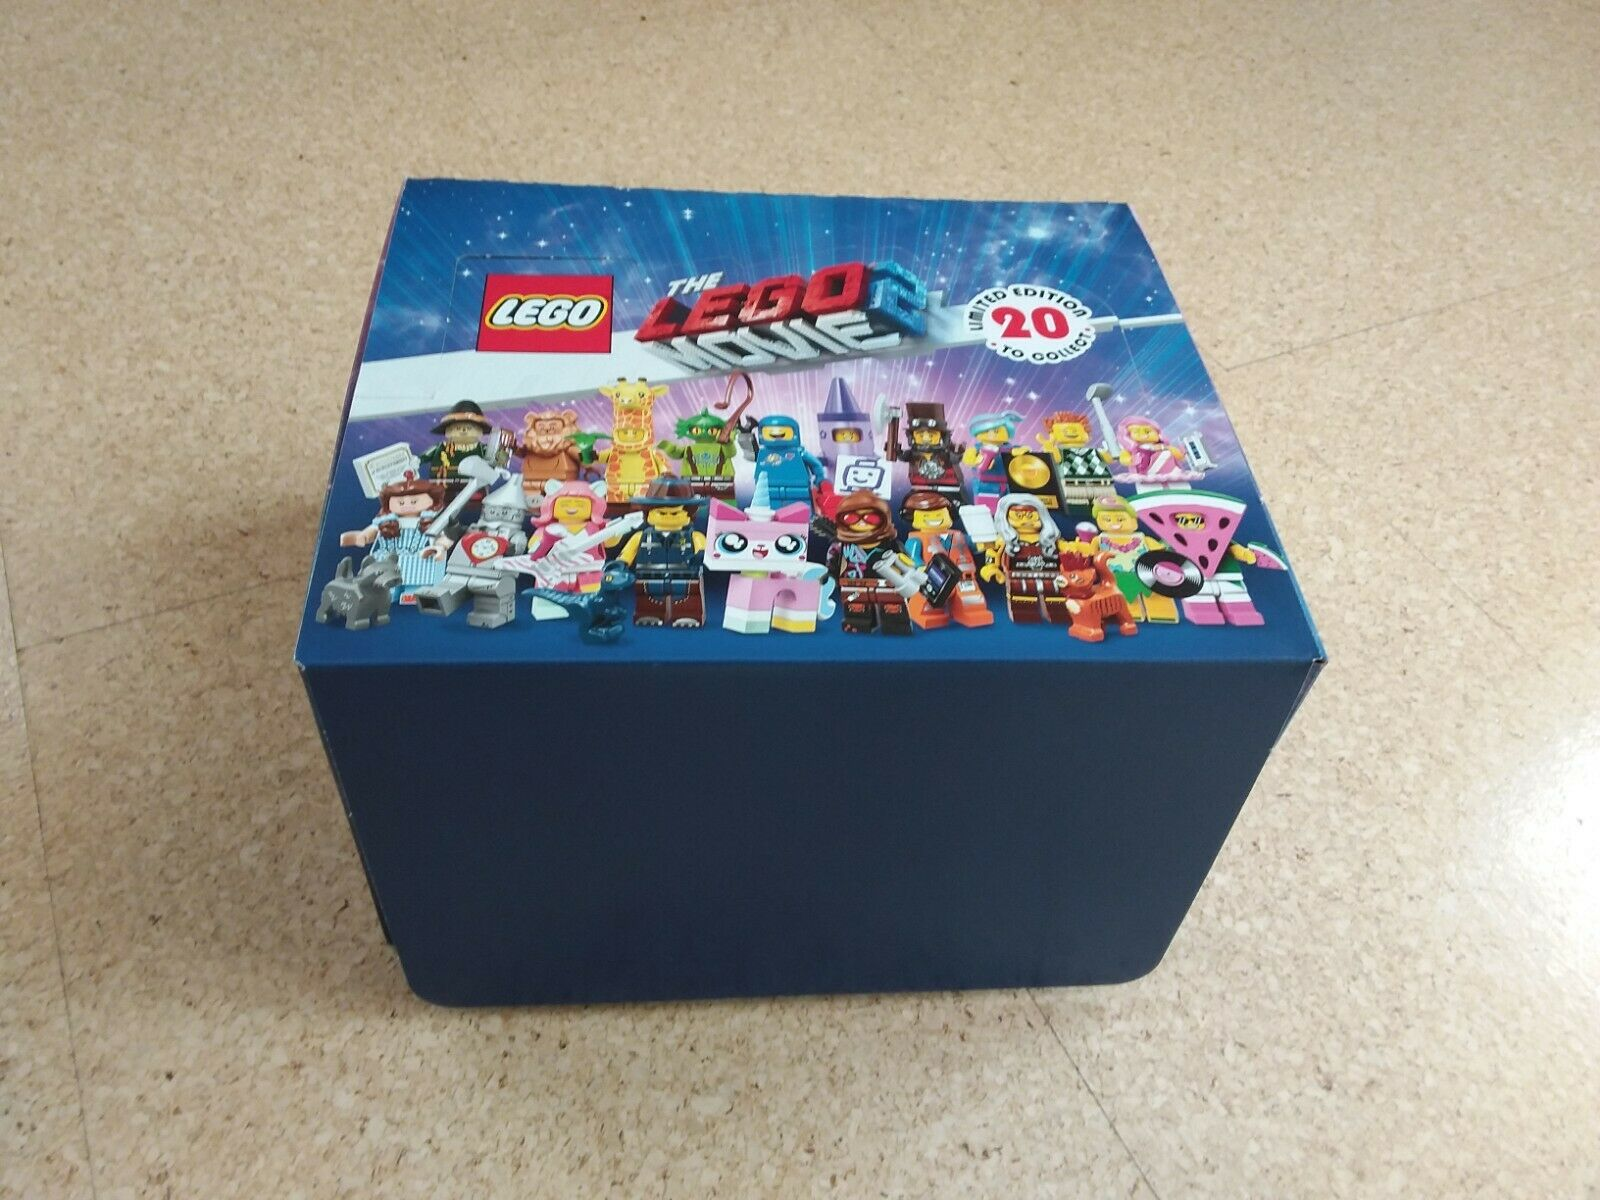 Lego 71023 Figur Serie The Movie 2 60 Tüten Neu ovp